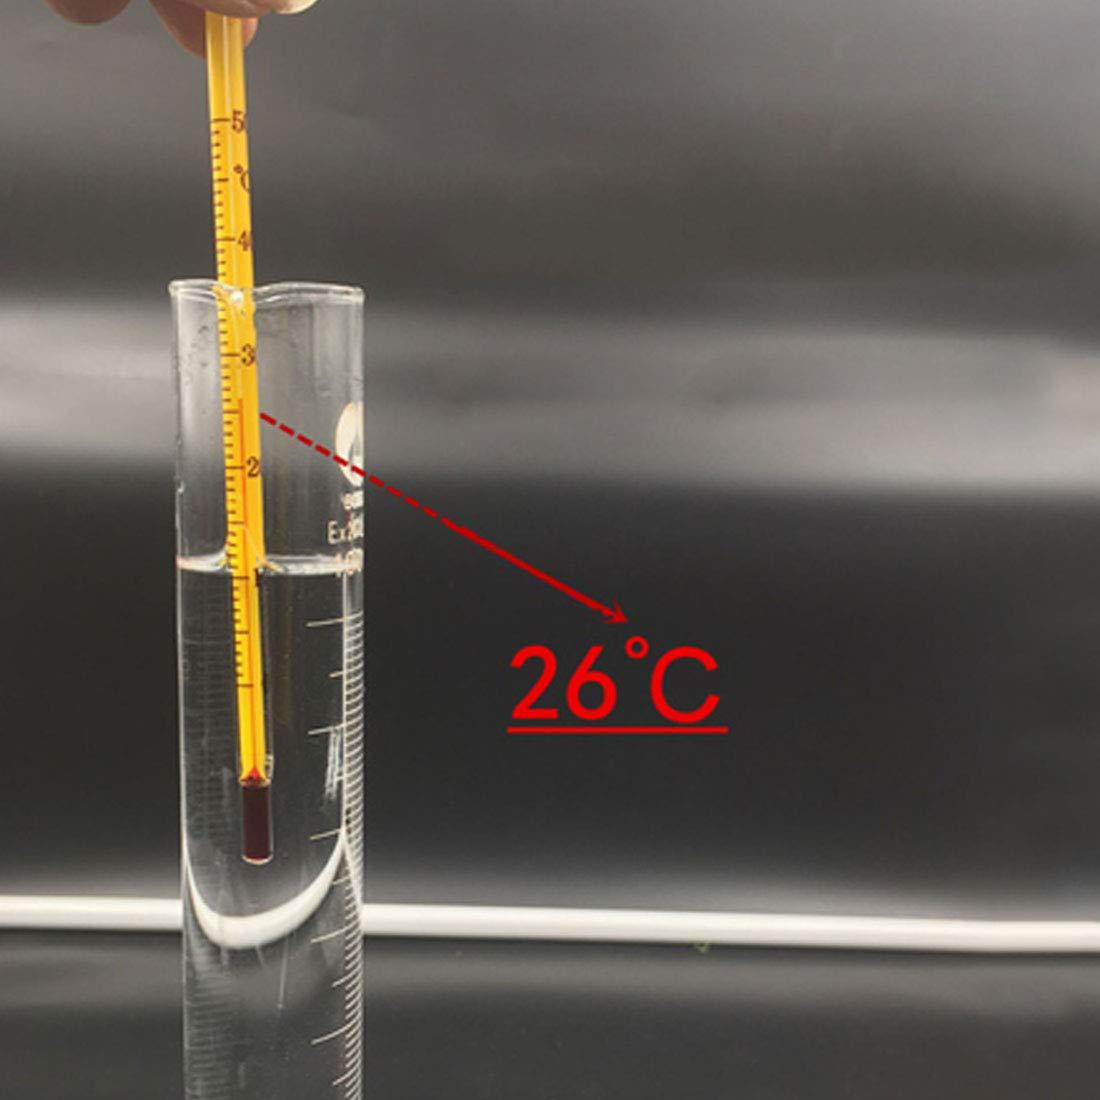 ihen-Tech Hydrometer meter Alcohol meter Alcohol tester Alcohol measurement tool Alcohol tester Wine hydrometer bar